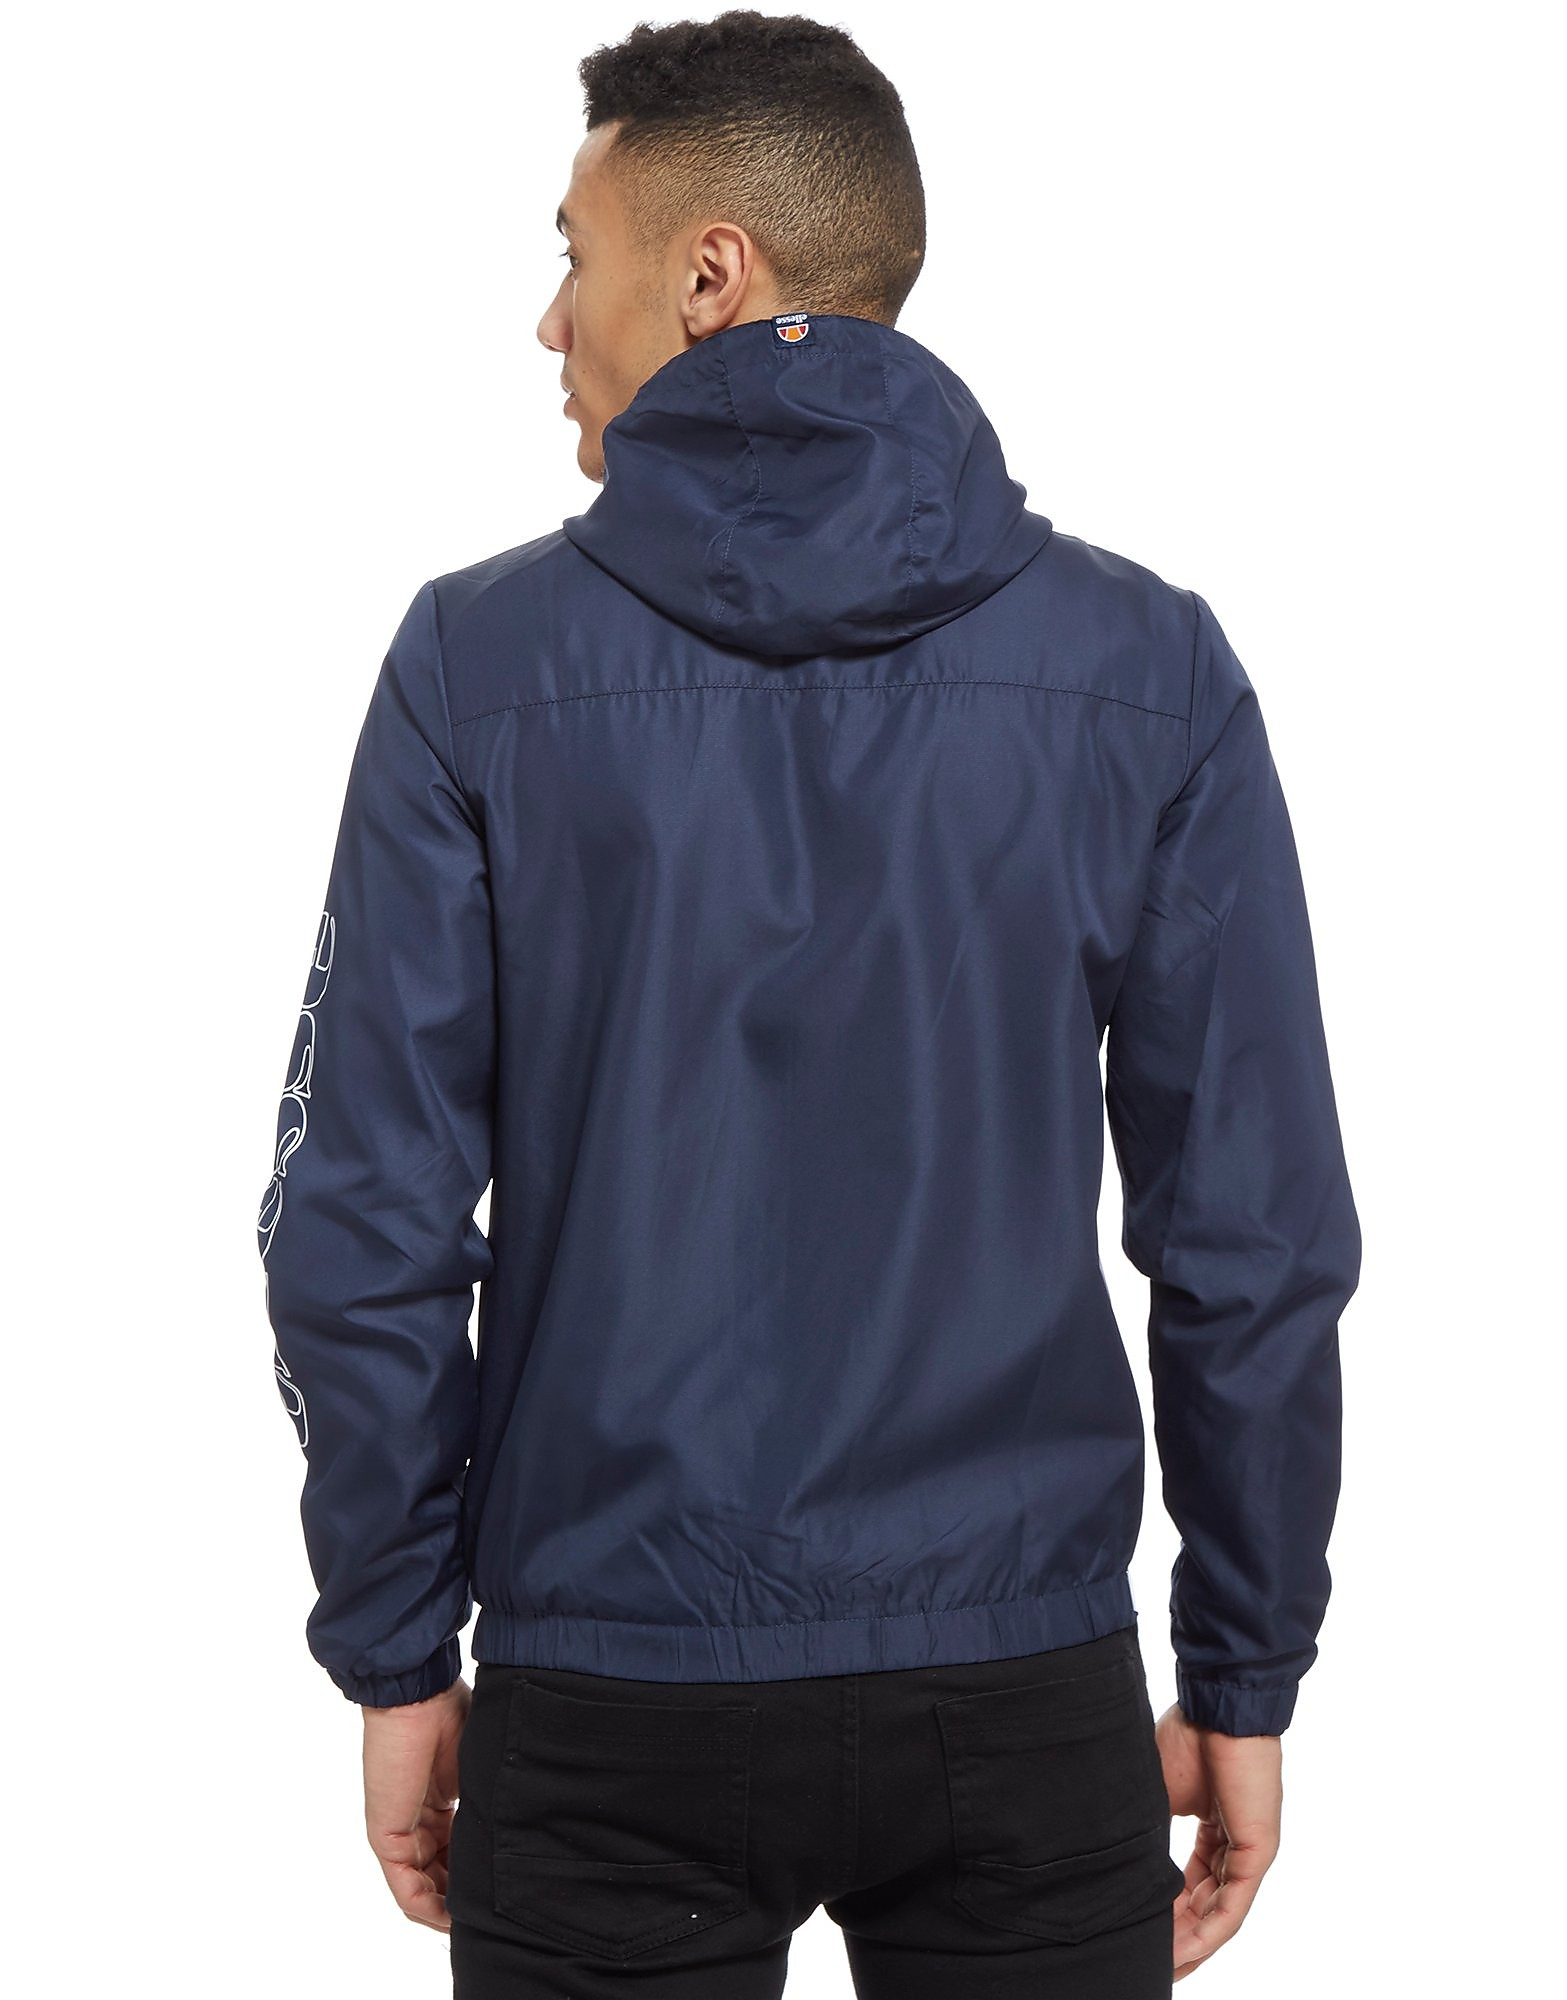 Ellesse Camozzi Half Zip Jacket